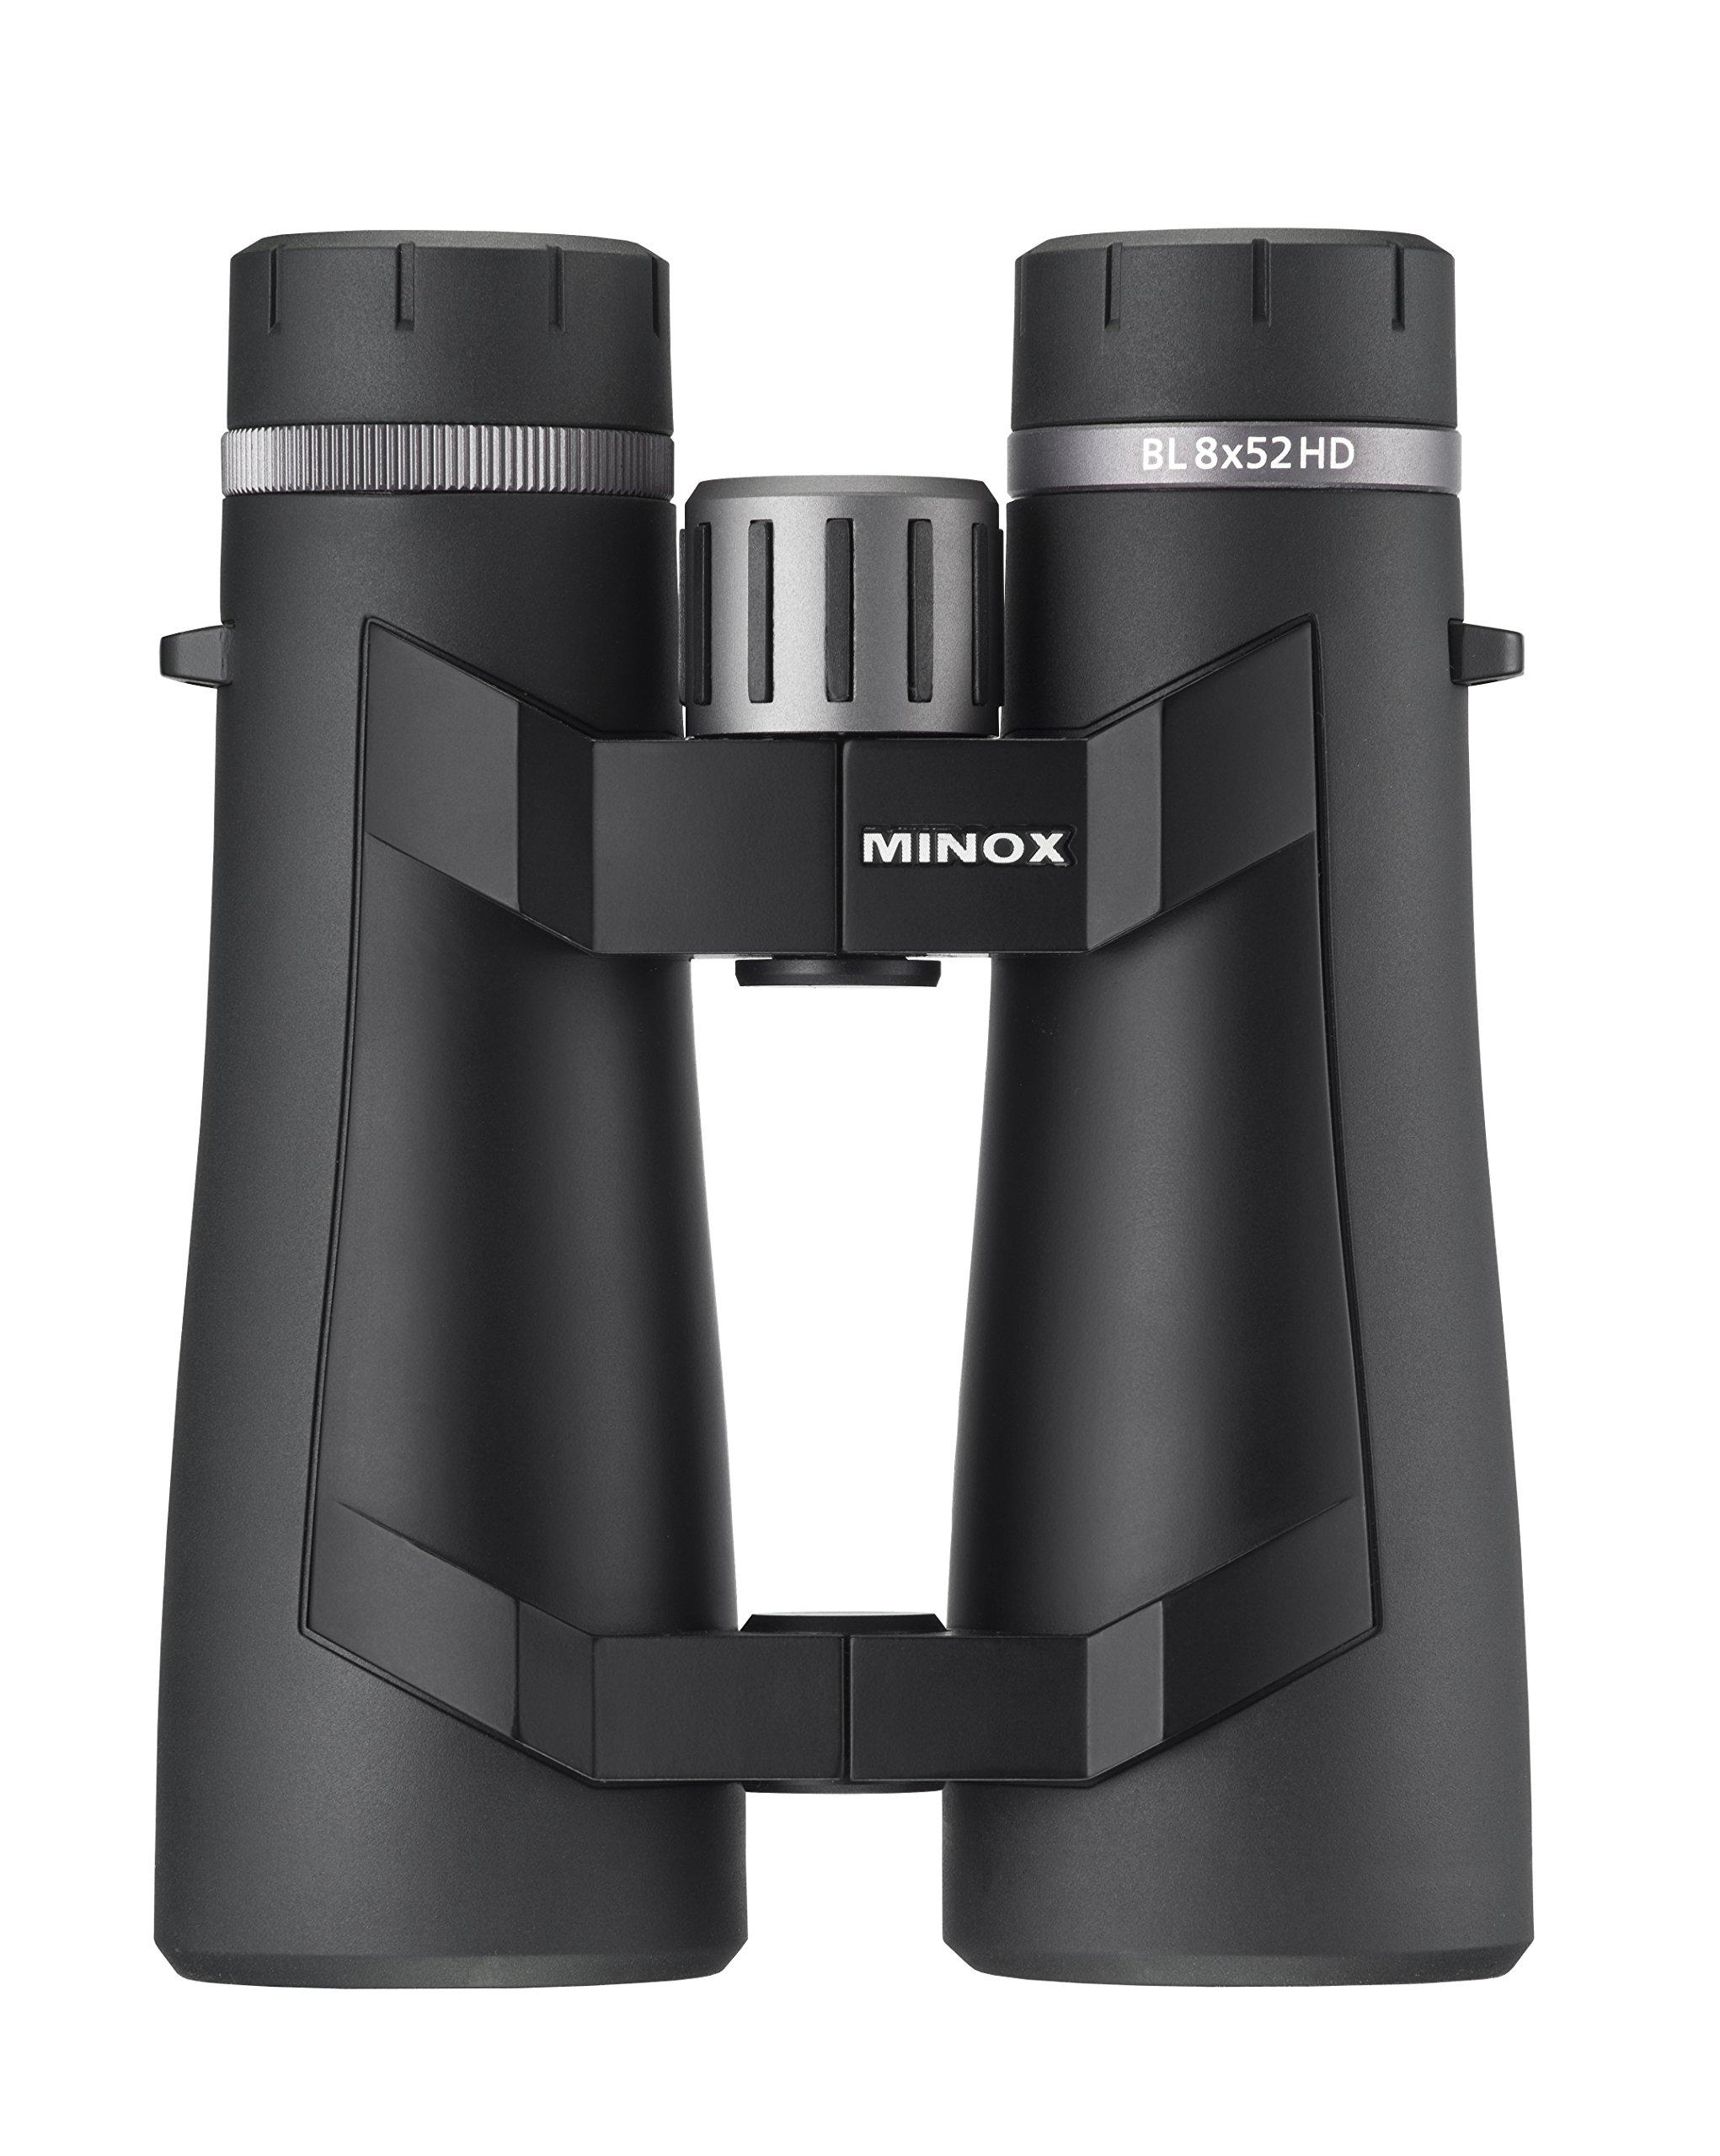 MINOX BL 8 x 52 Binocular – High Grade HD Glass w/ Advanced Lens Coating and Comfort Bridge Design for Single Hand Gripping and Stability – German Precision Engineering